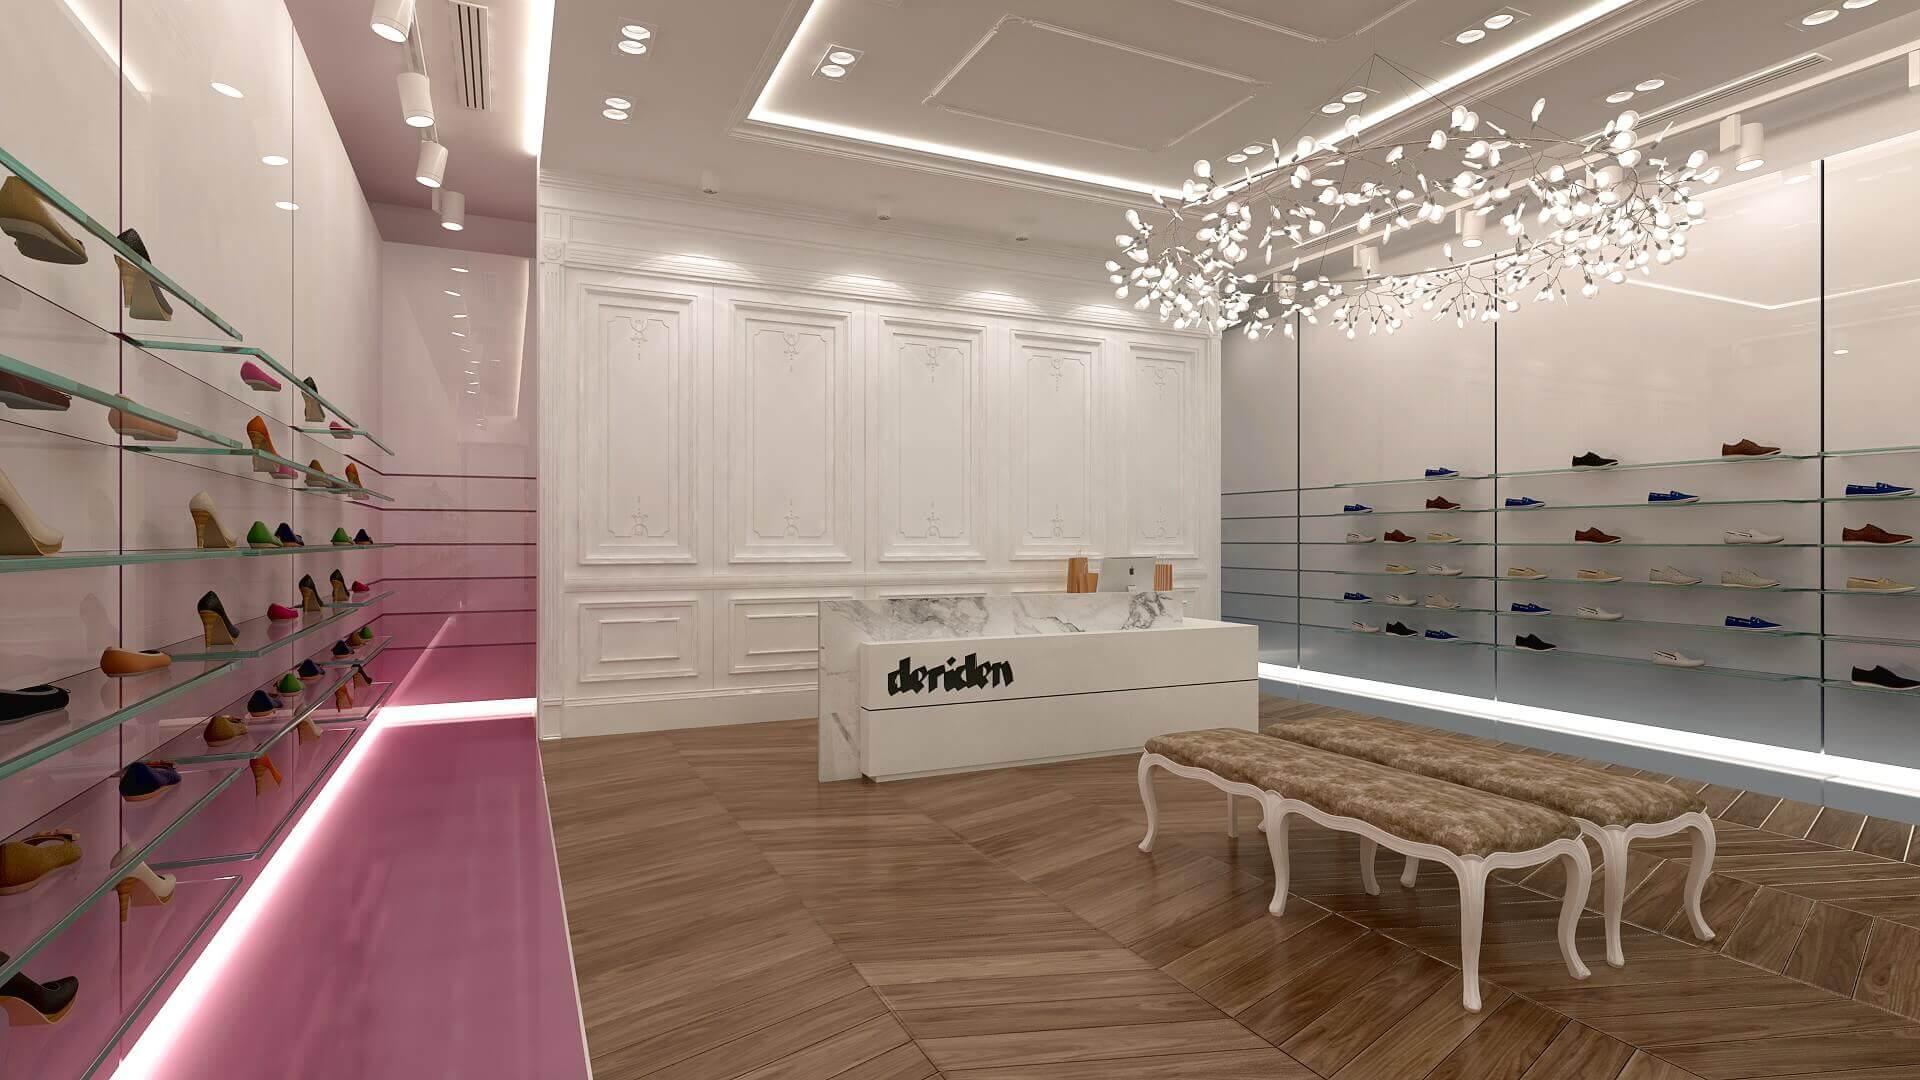 Beşiktaş 2017 Deriden Concept Retail